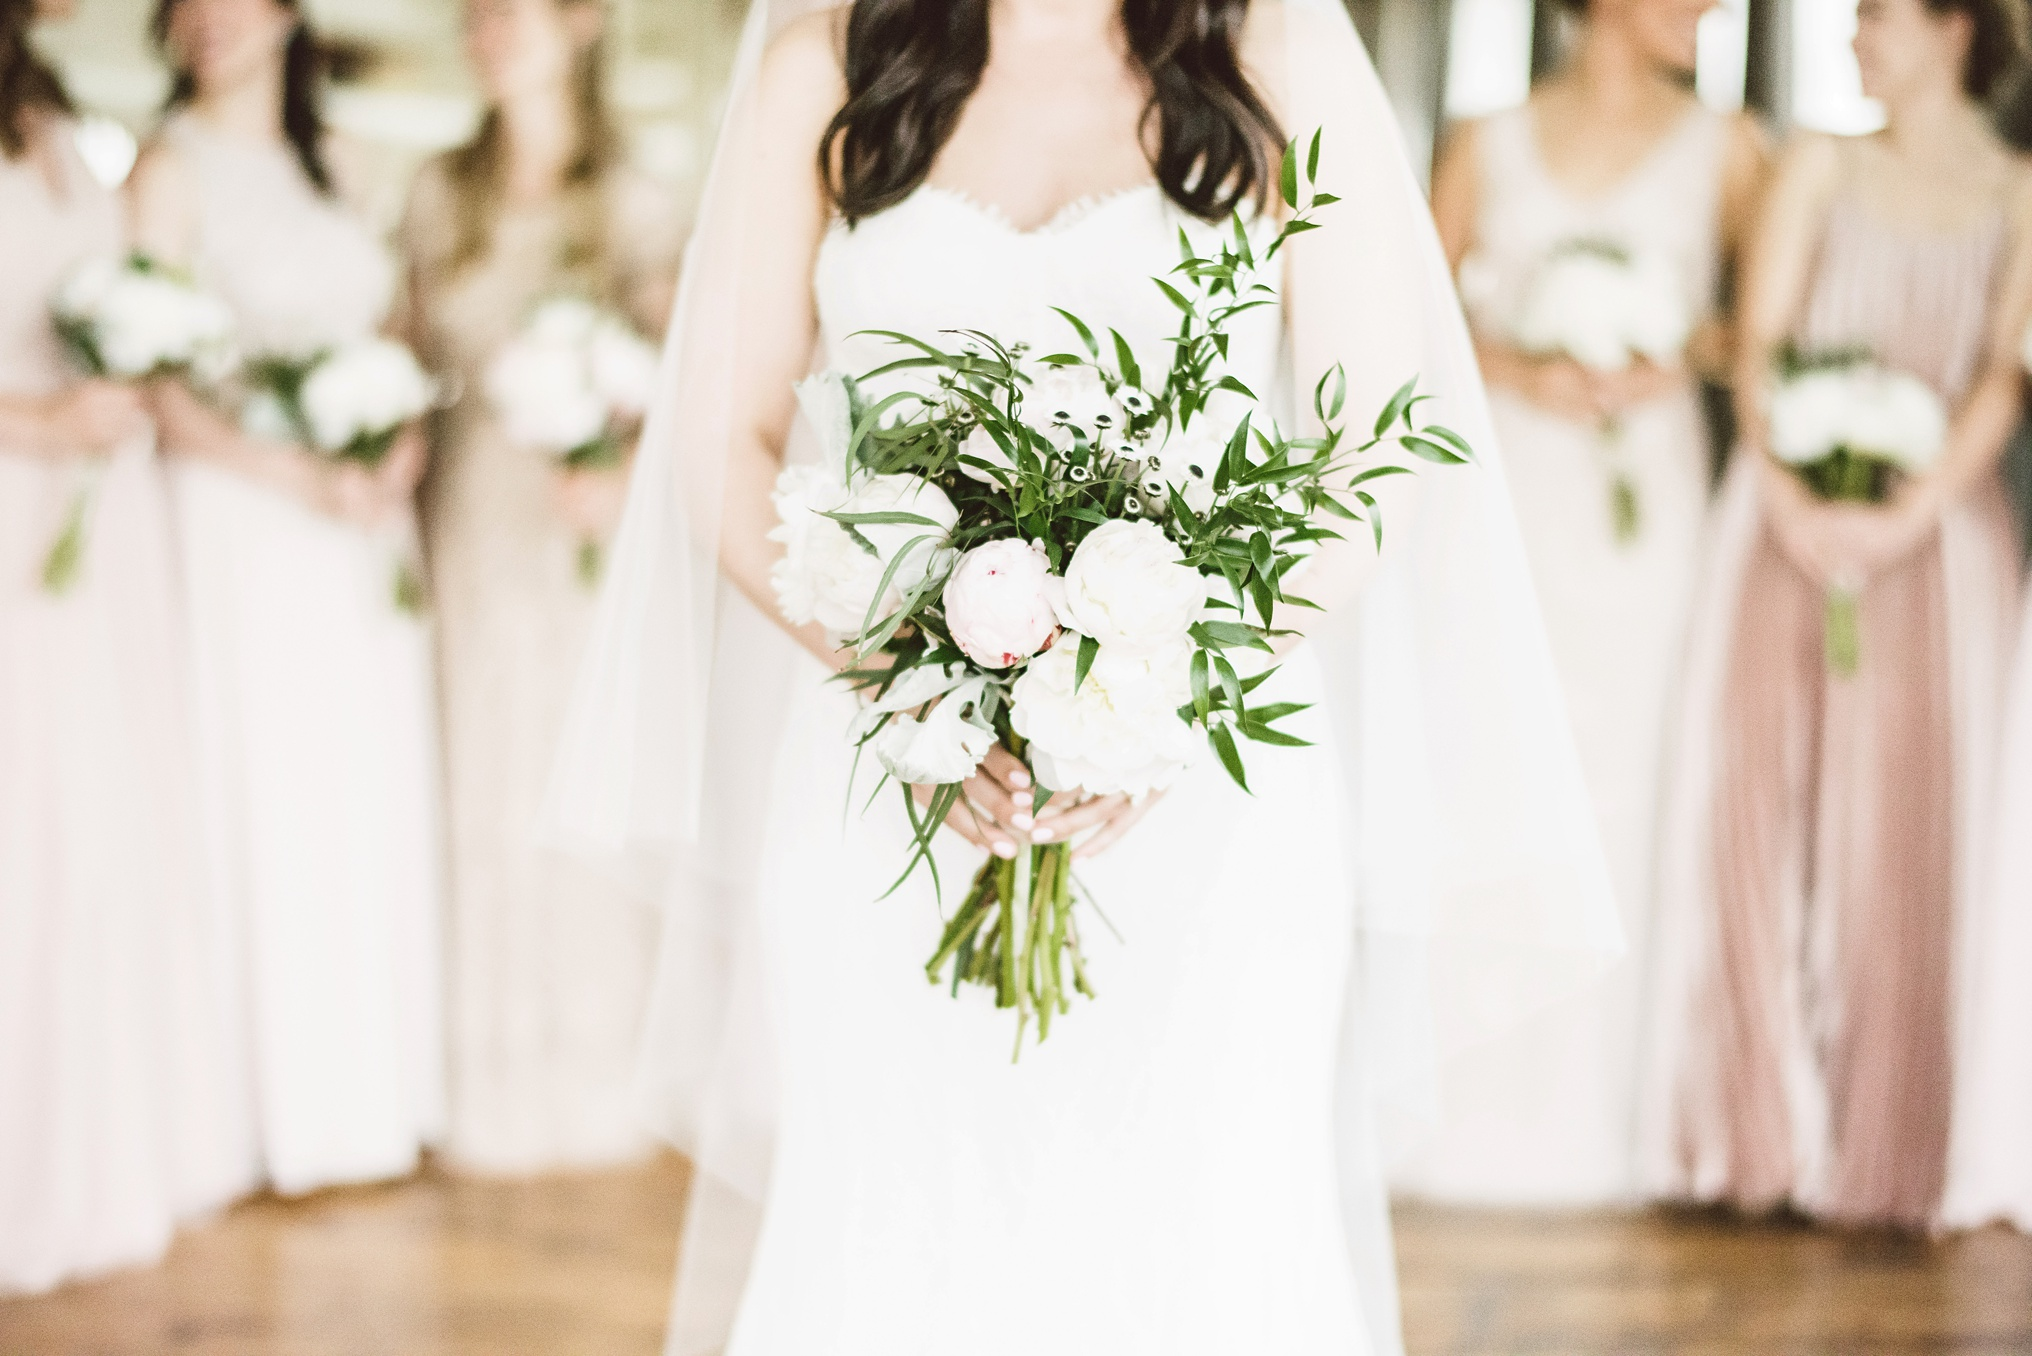 best_wedding_photography_2017_by_lucas_botz_photography_093.jpg